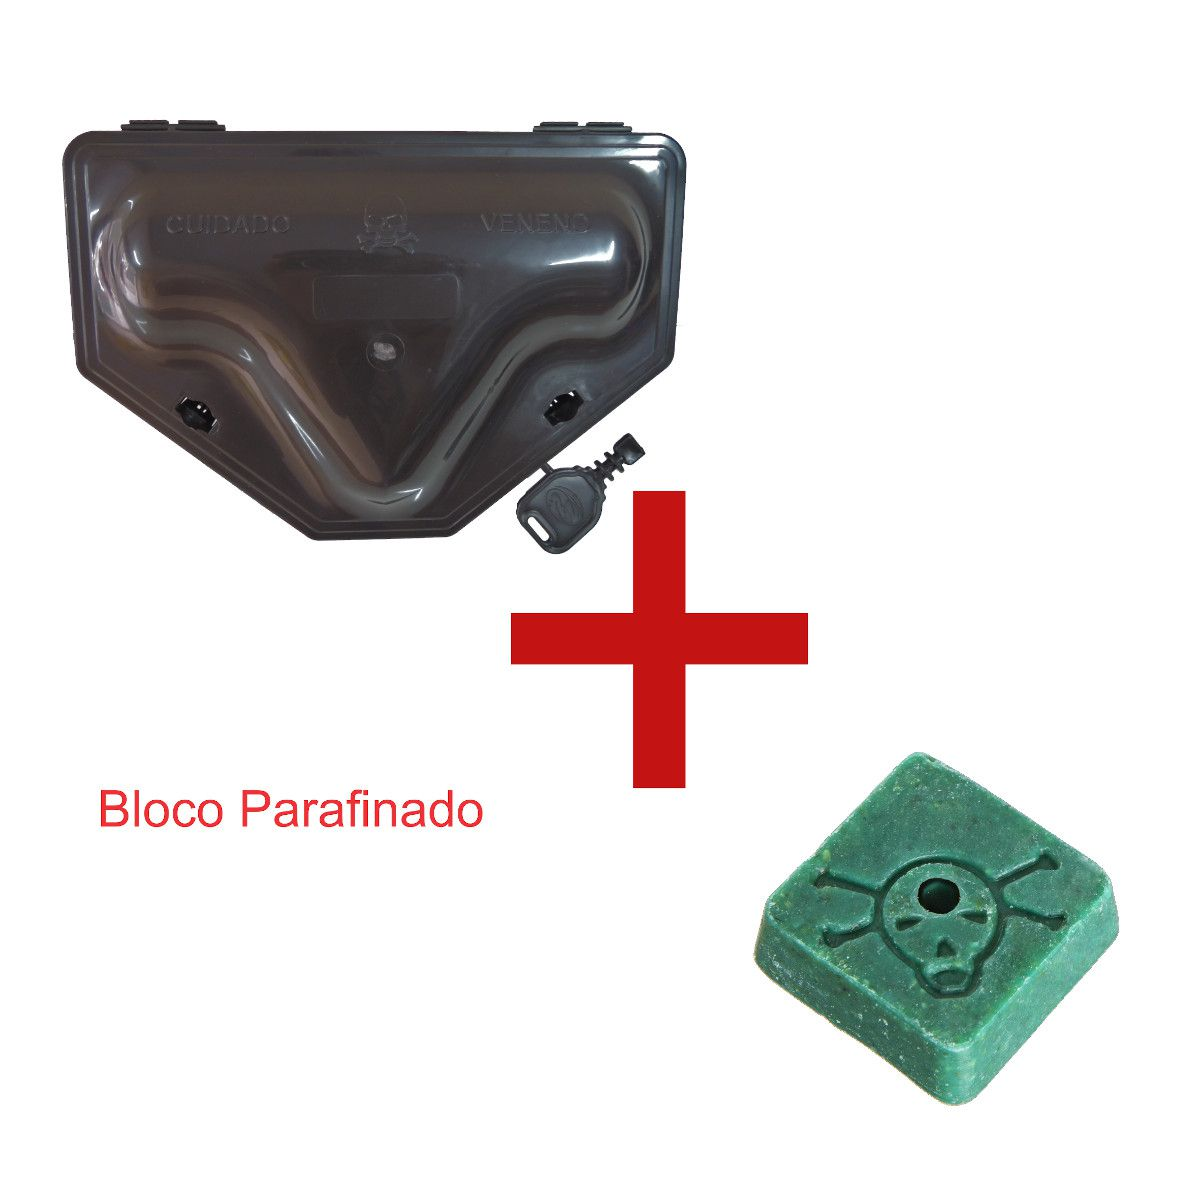 KIT 700 Porta Iscas Reforçado Ratoeira 2 TRAVAS Chave Ratos